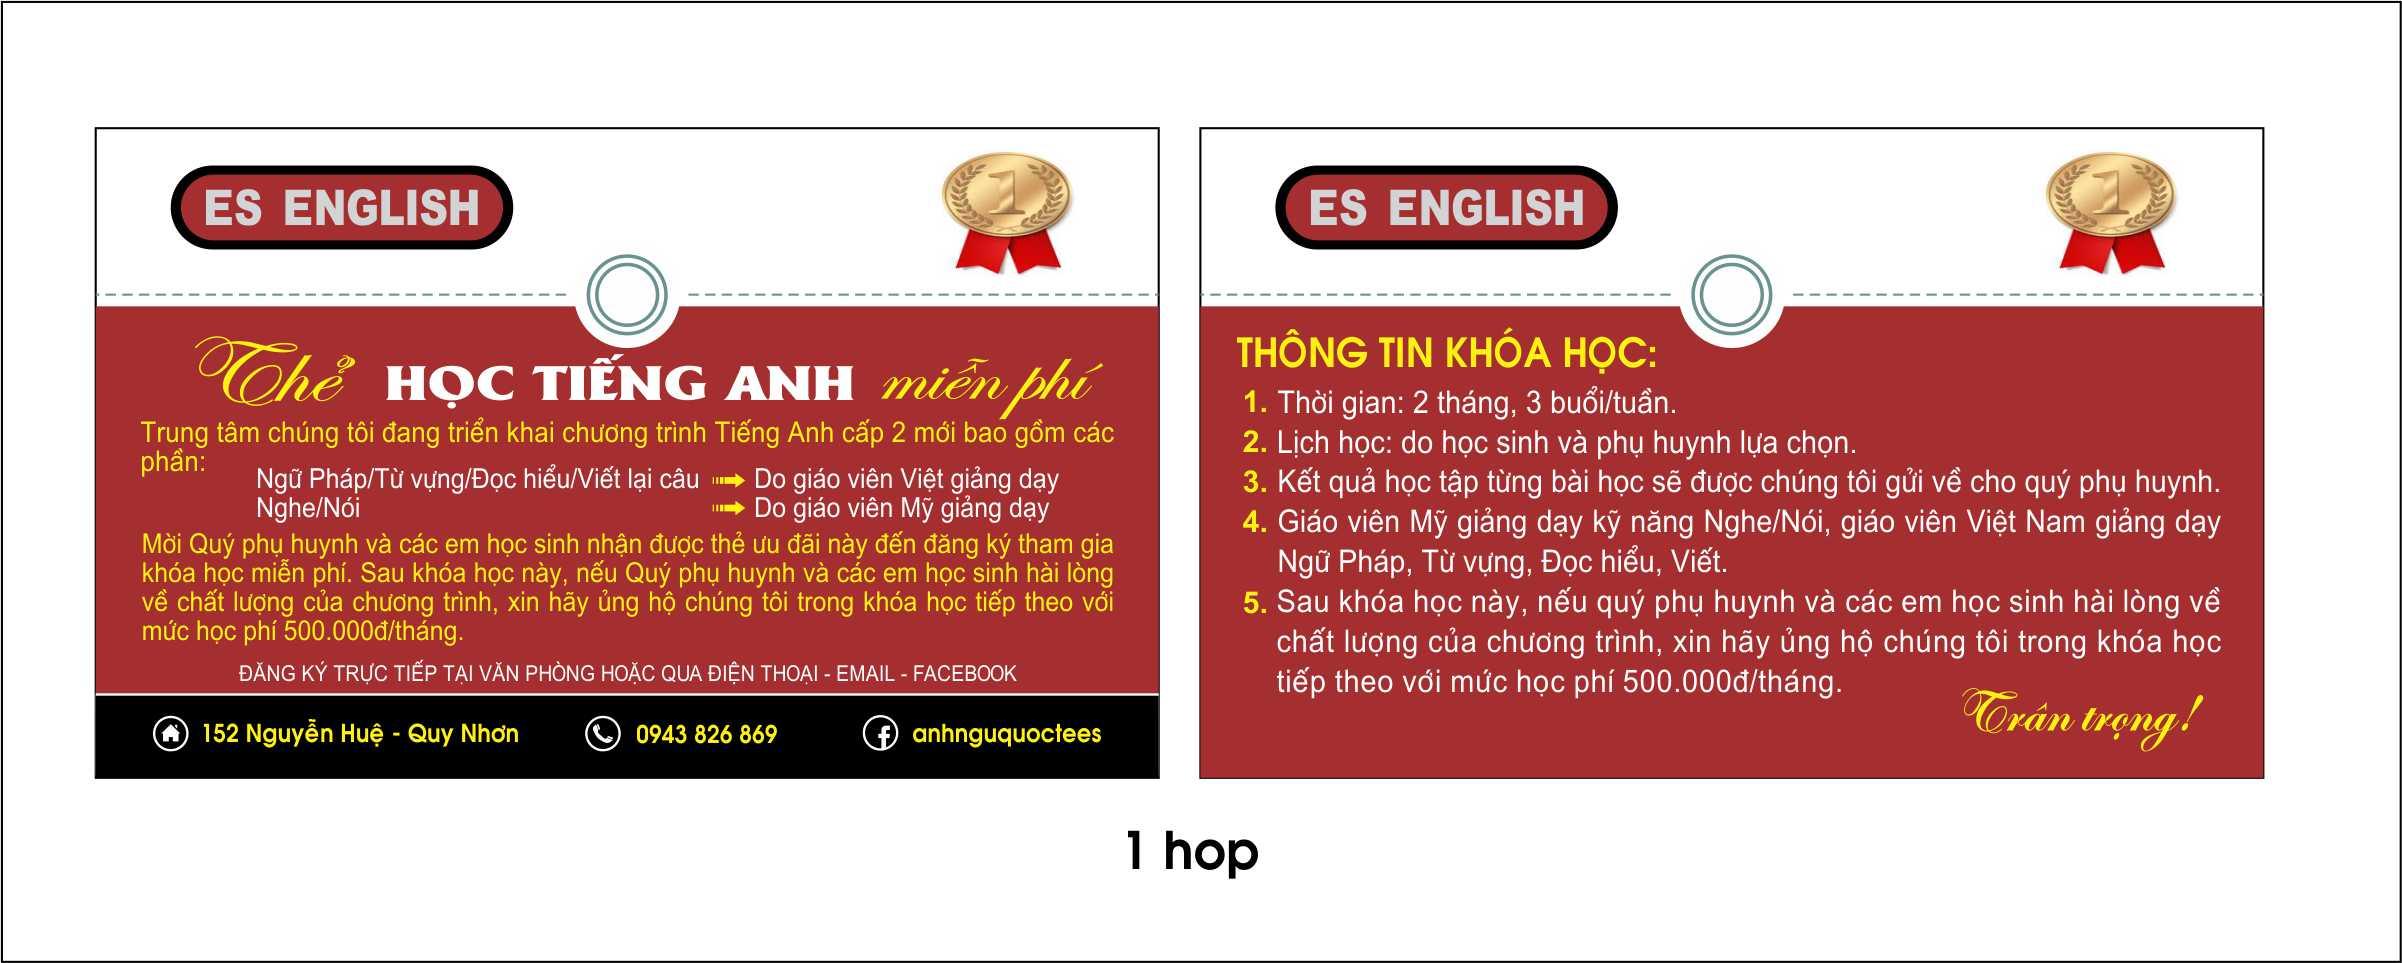 English teaching jobs in Quy Nhon (start immediately)